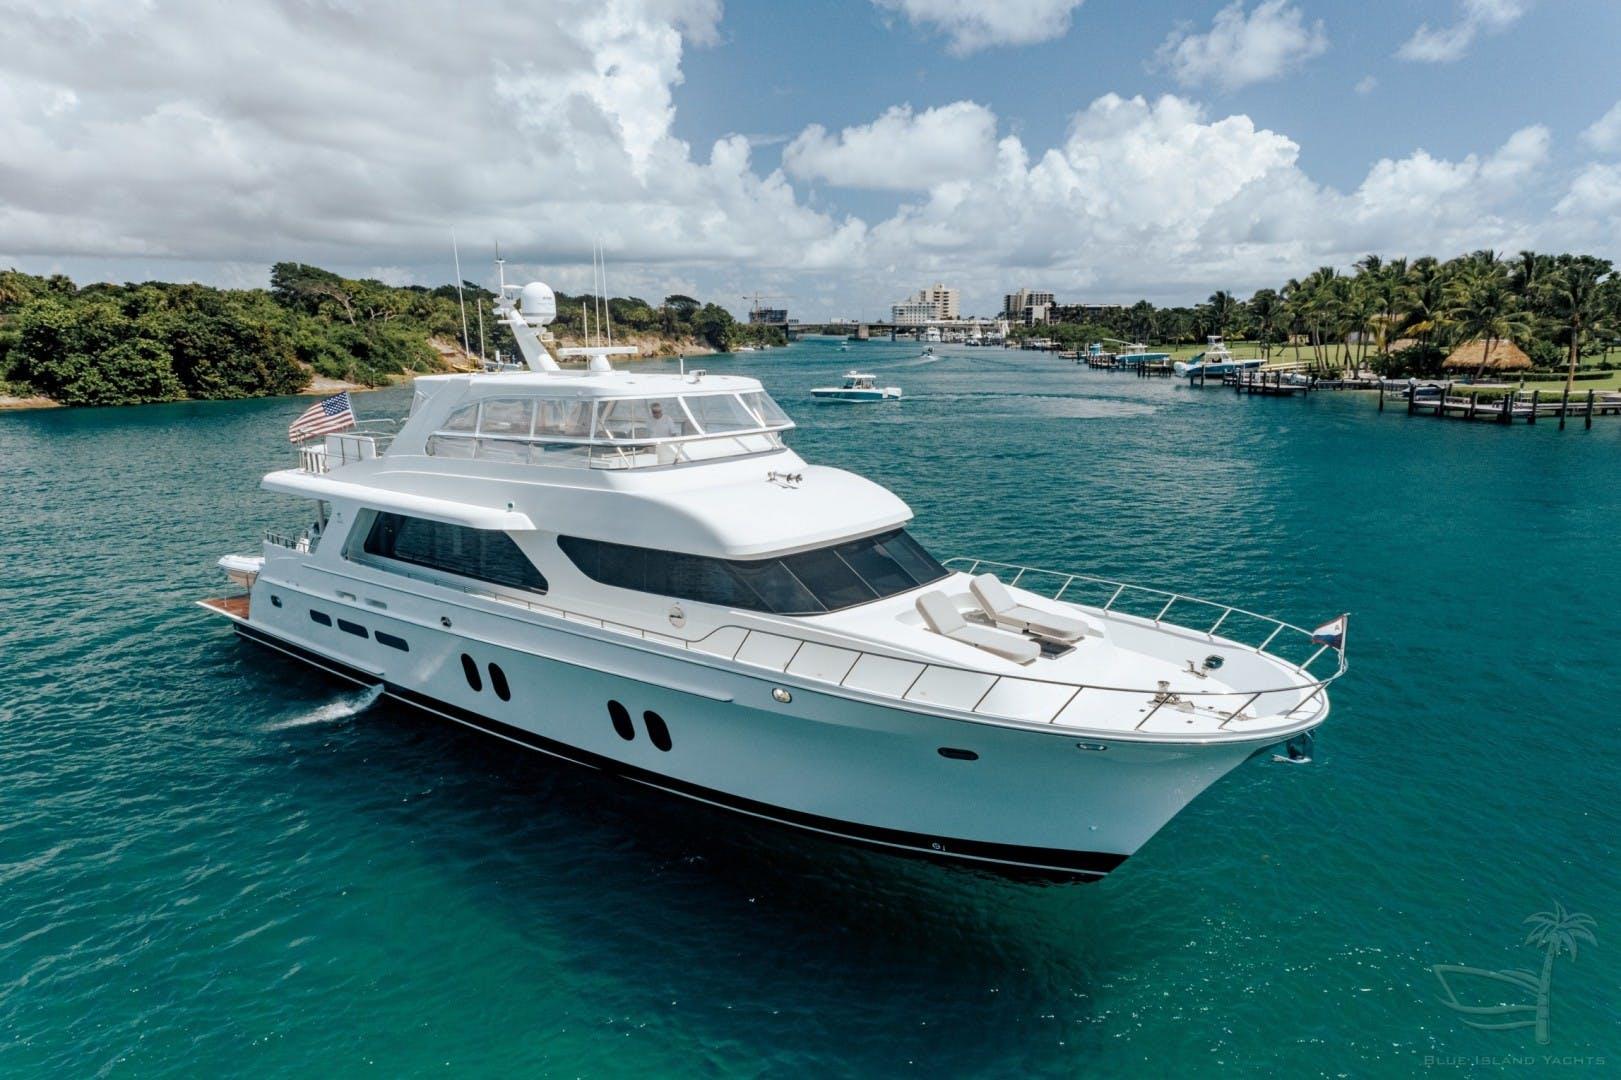 2018 Cheoy Lee 78' 78 Bravo Sport Motor Yacht Deep Blue Zee   Picture 8 of 174